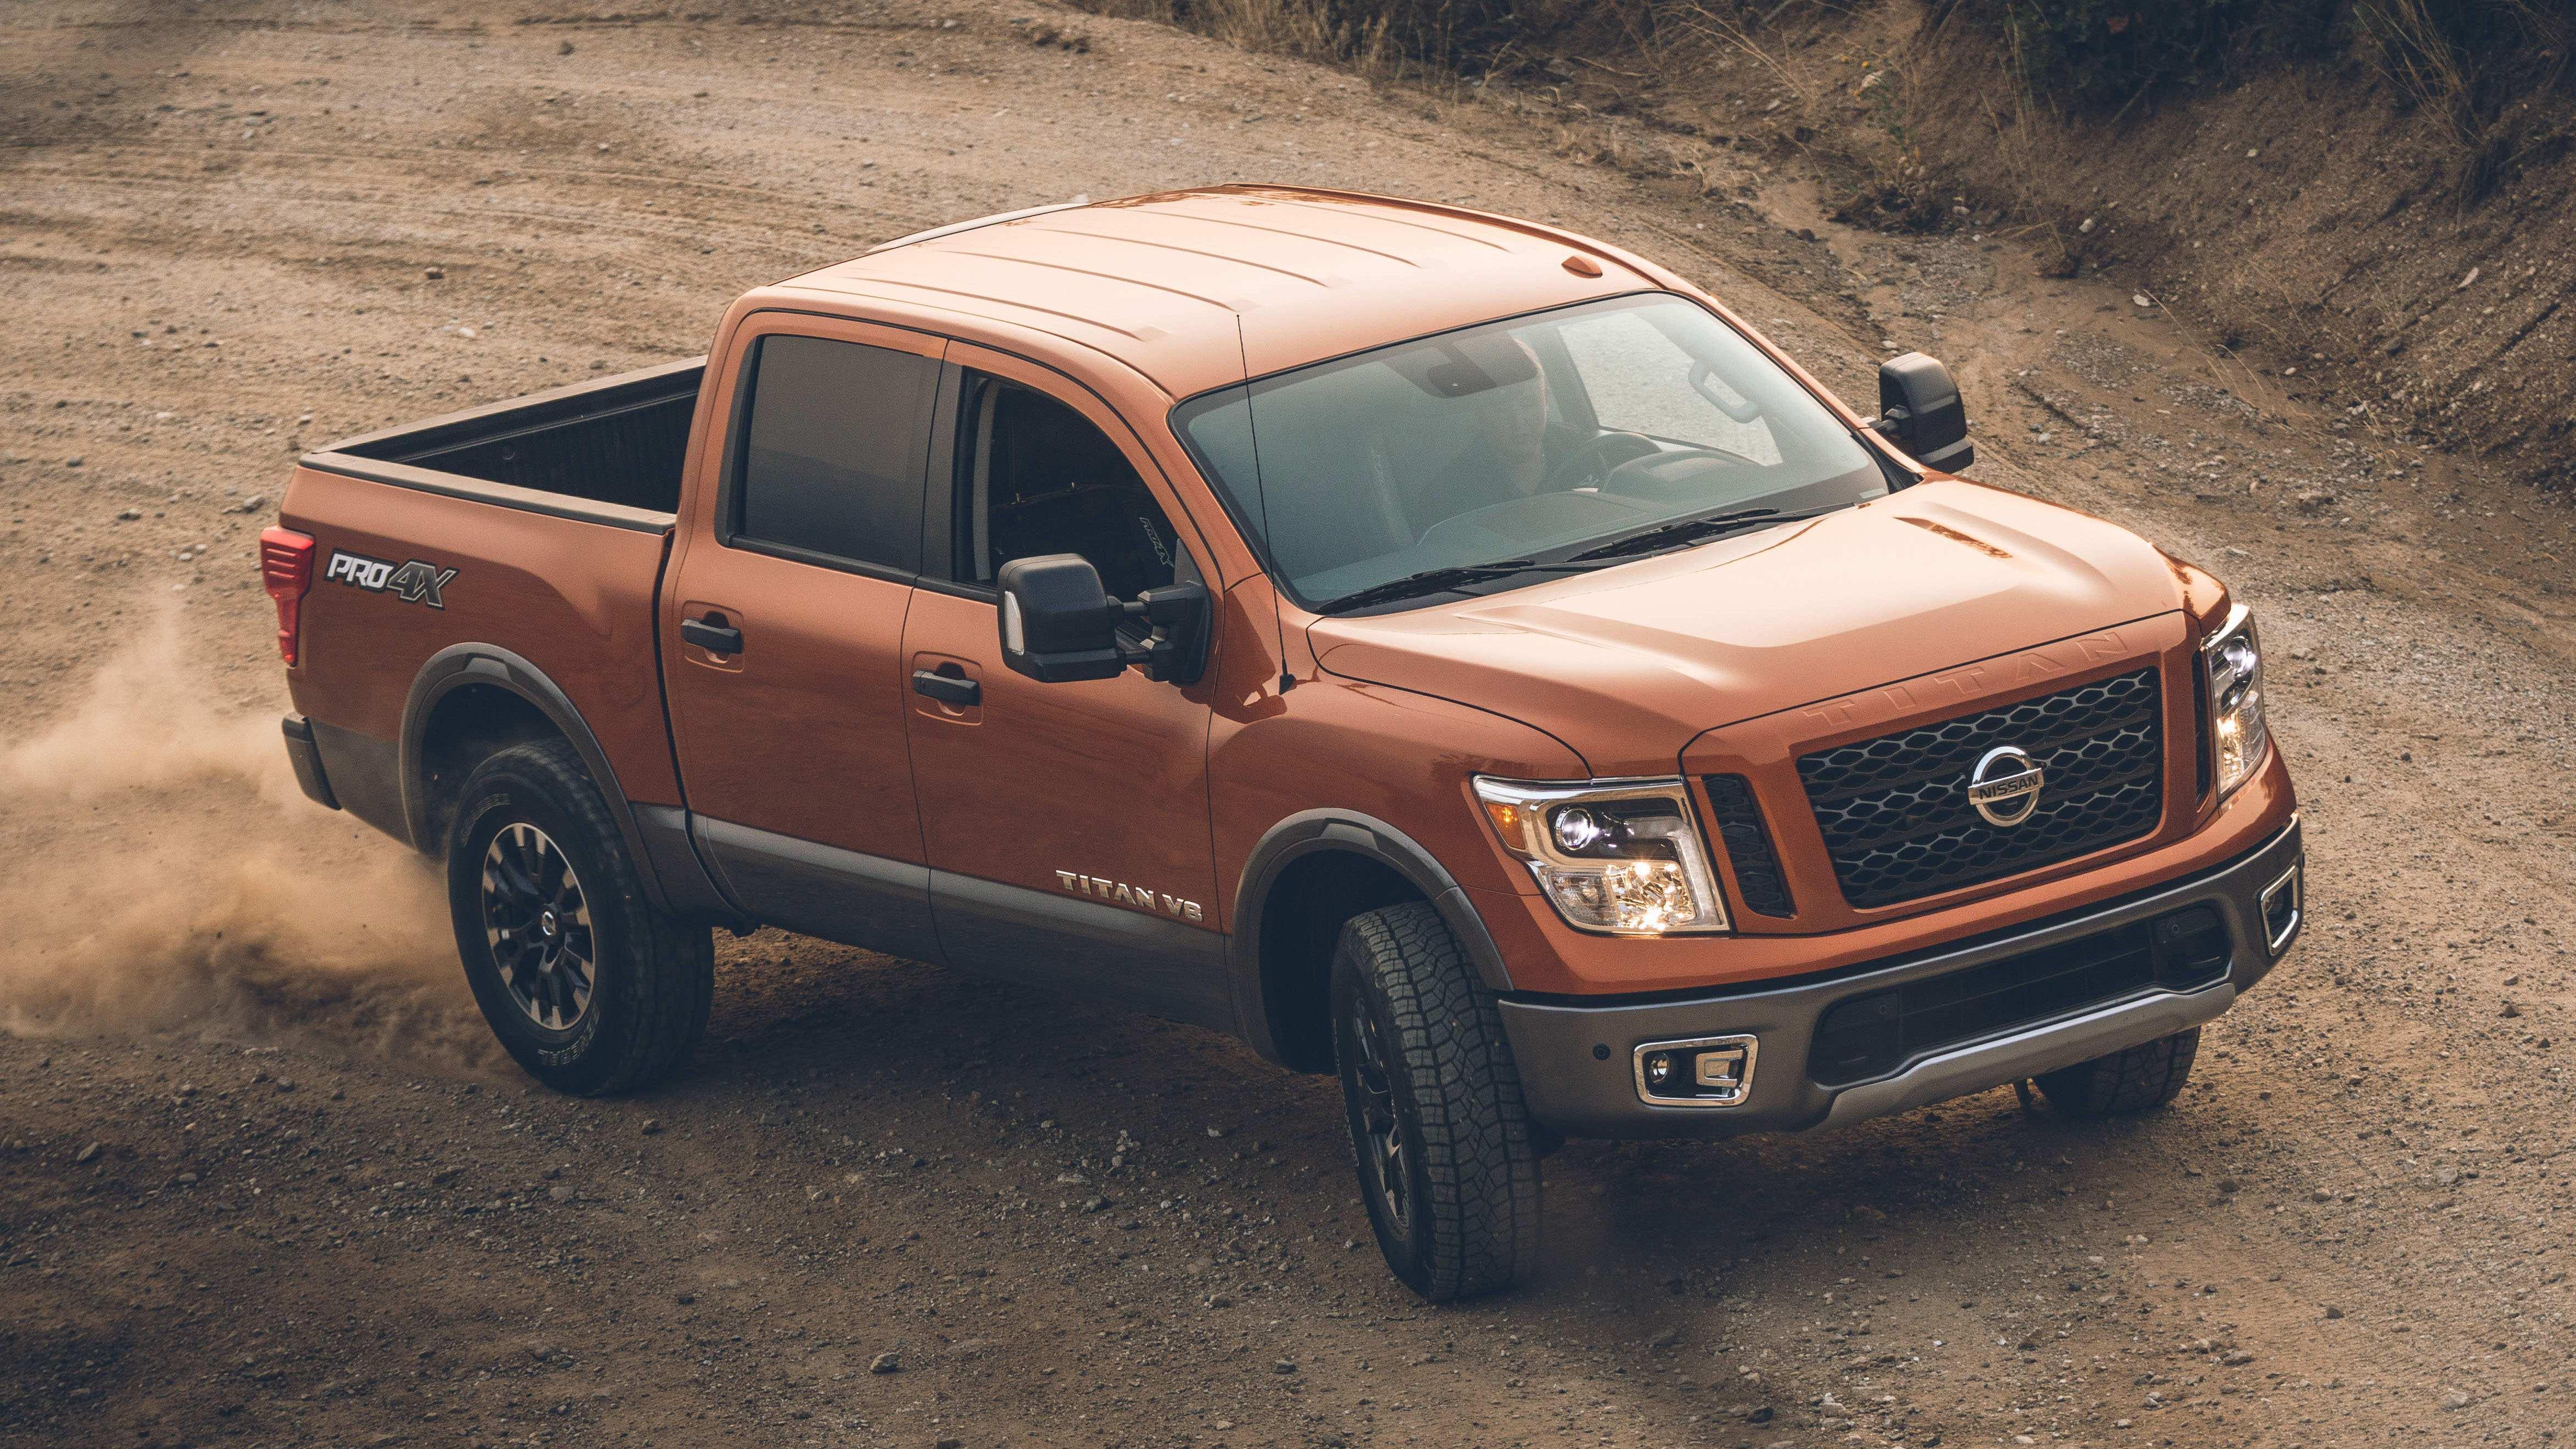 79 Great 2019 Nissan Titan Release Date Rumors by 2019 Nissan Titan Release Date